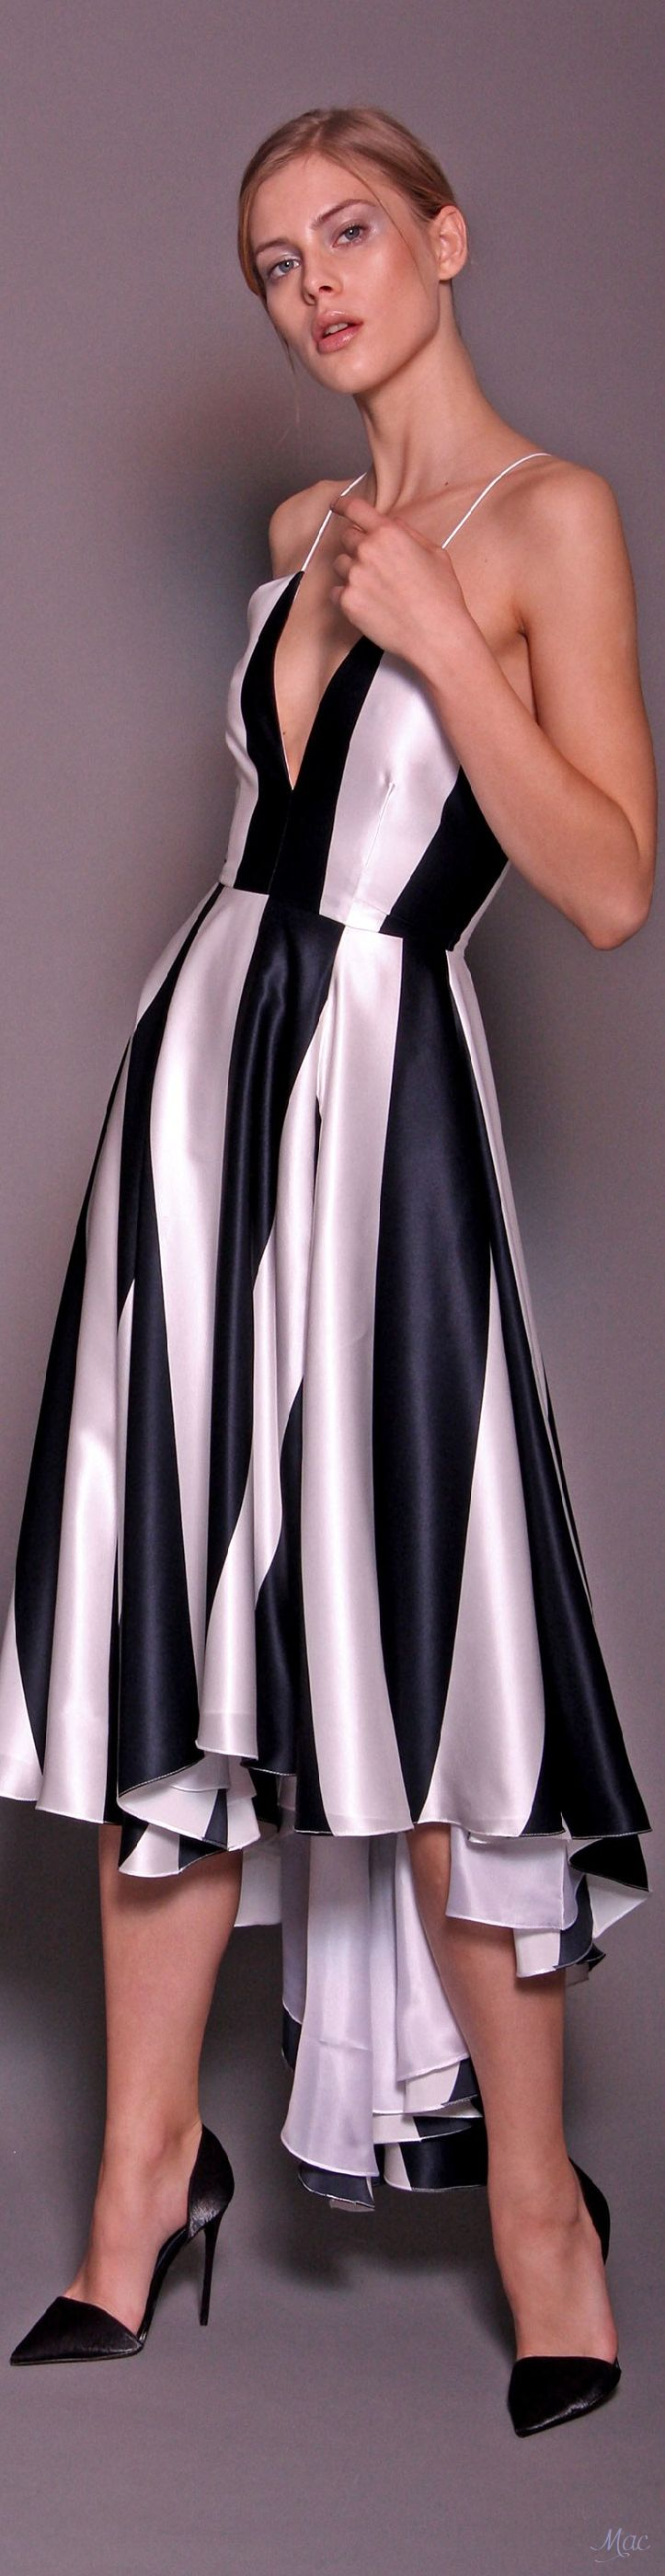 best my inspiration of styles images on pinterest feminine